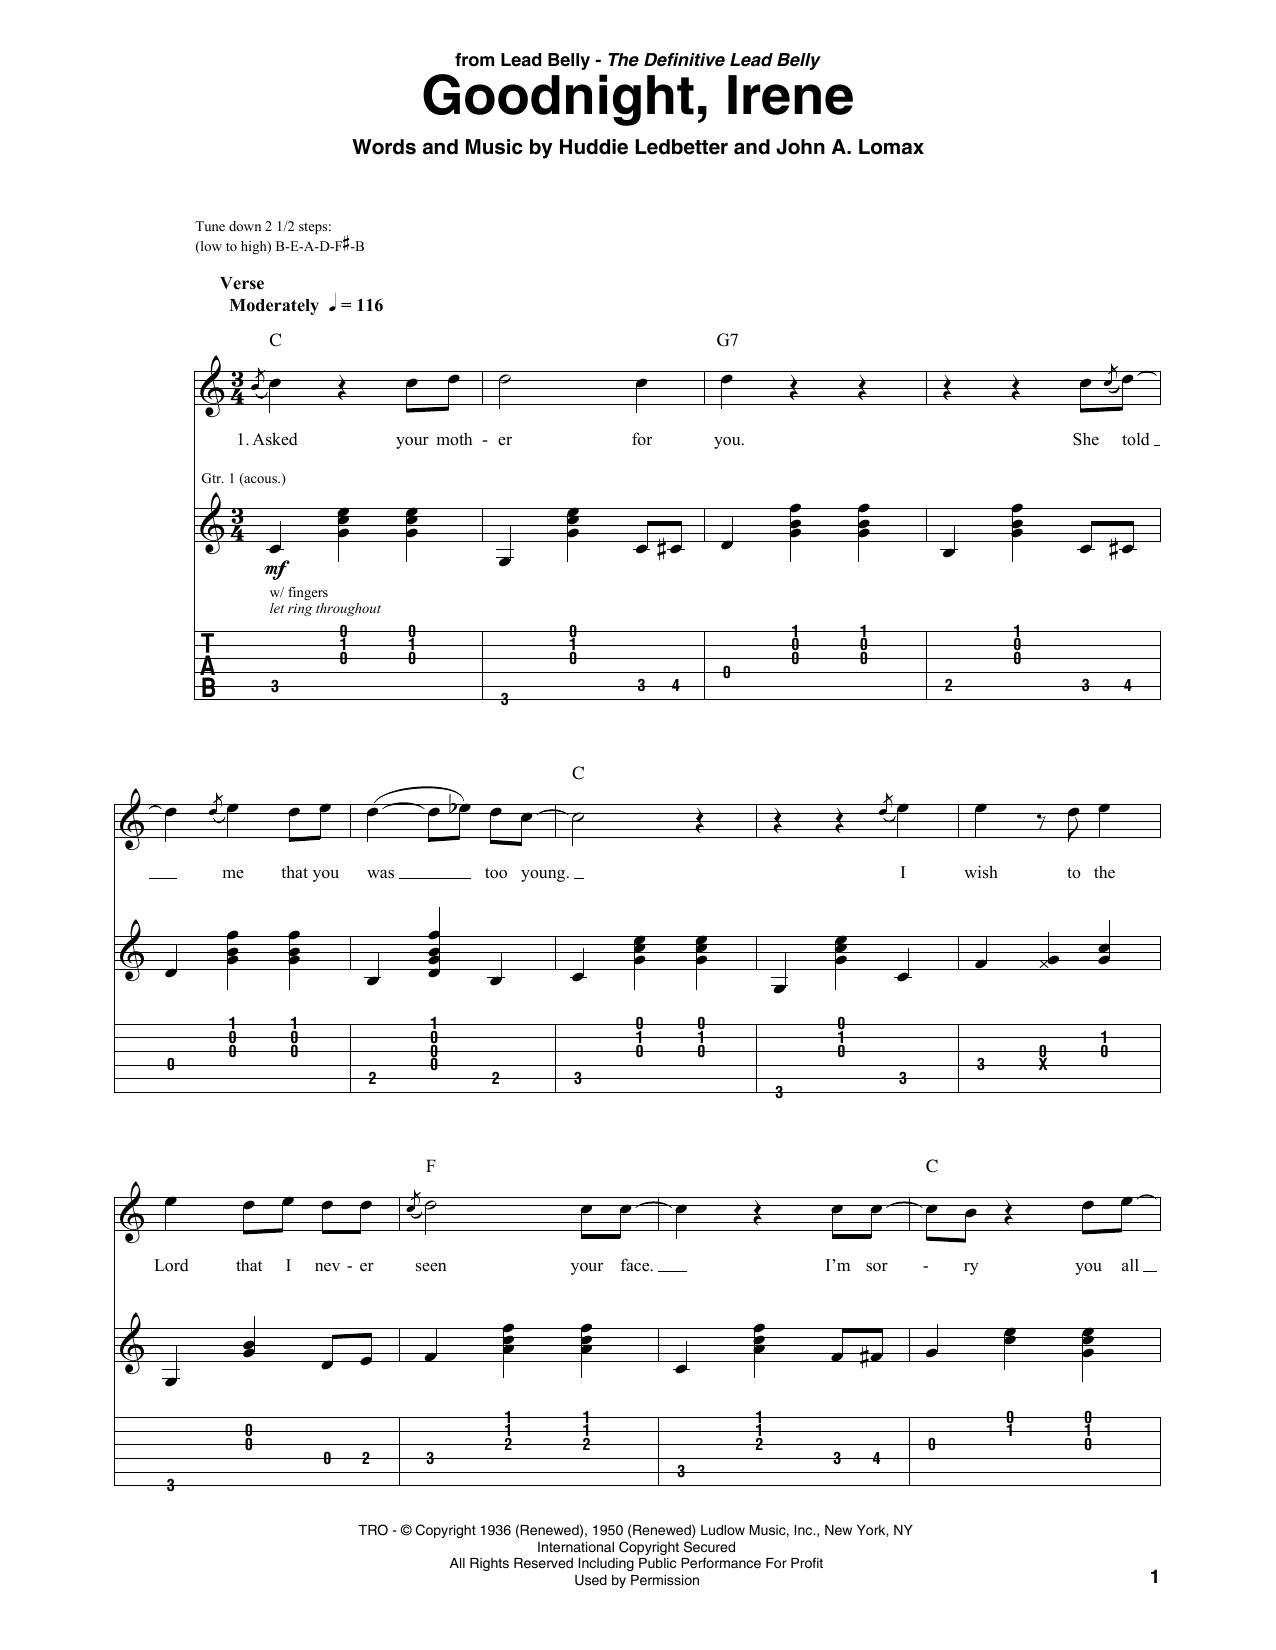 Goodnight, Irene (Solo Guitar Tab)